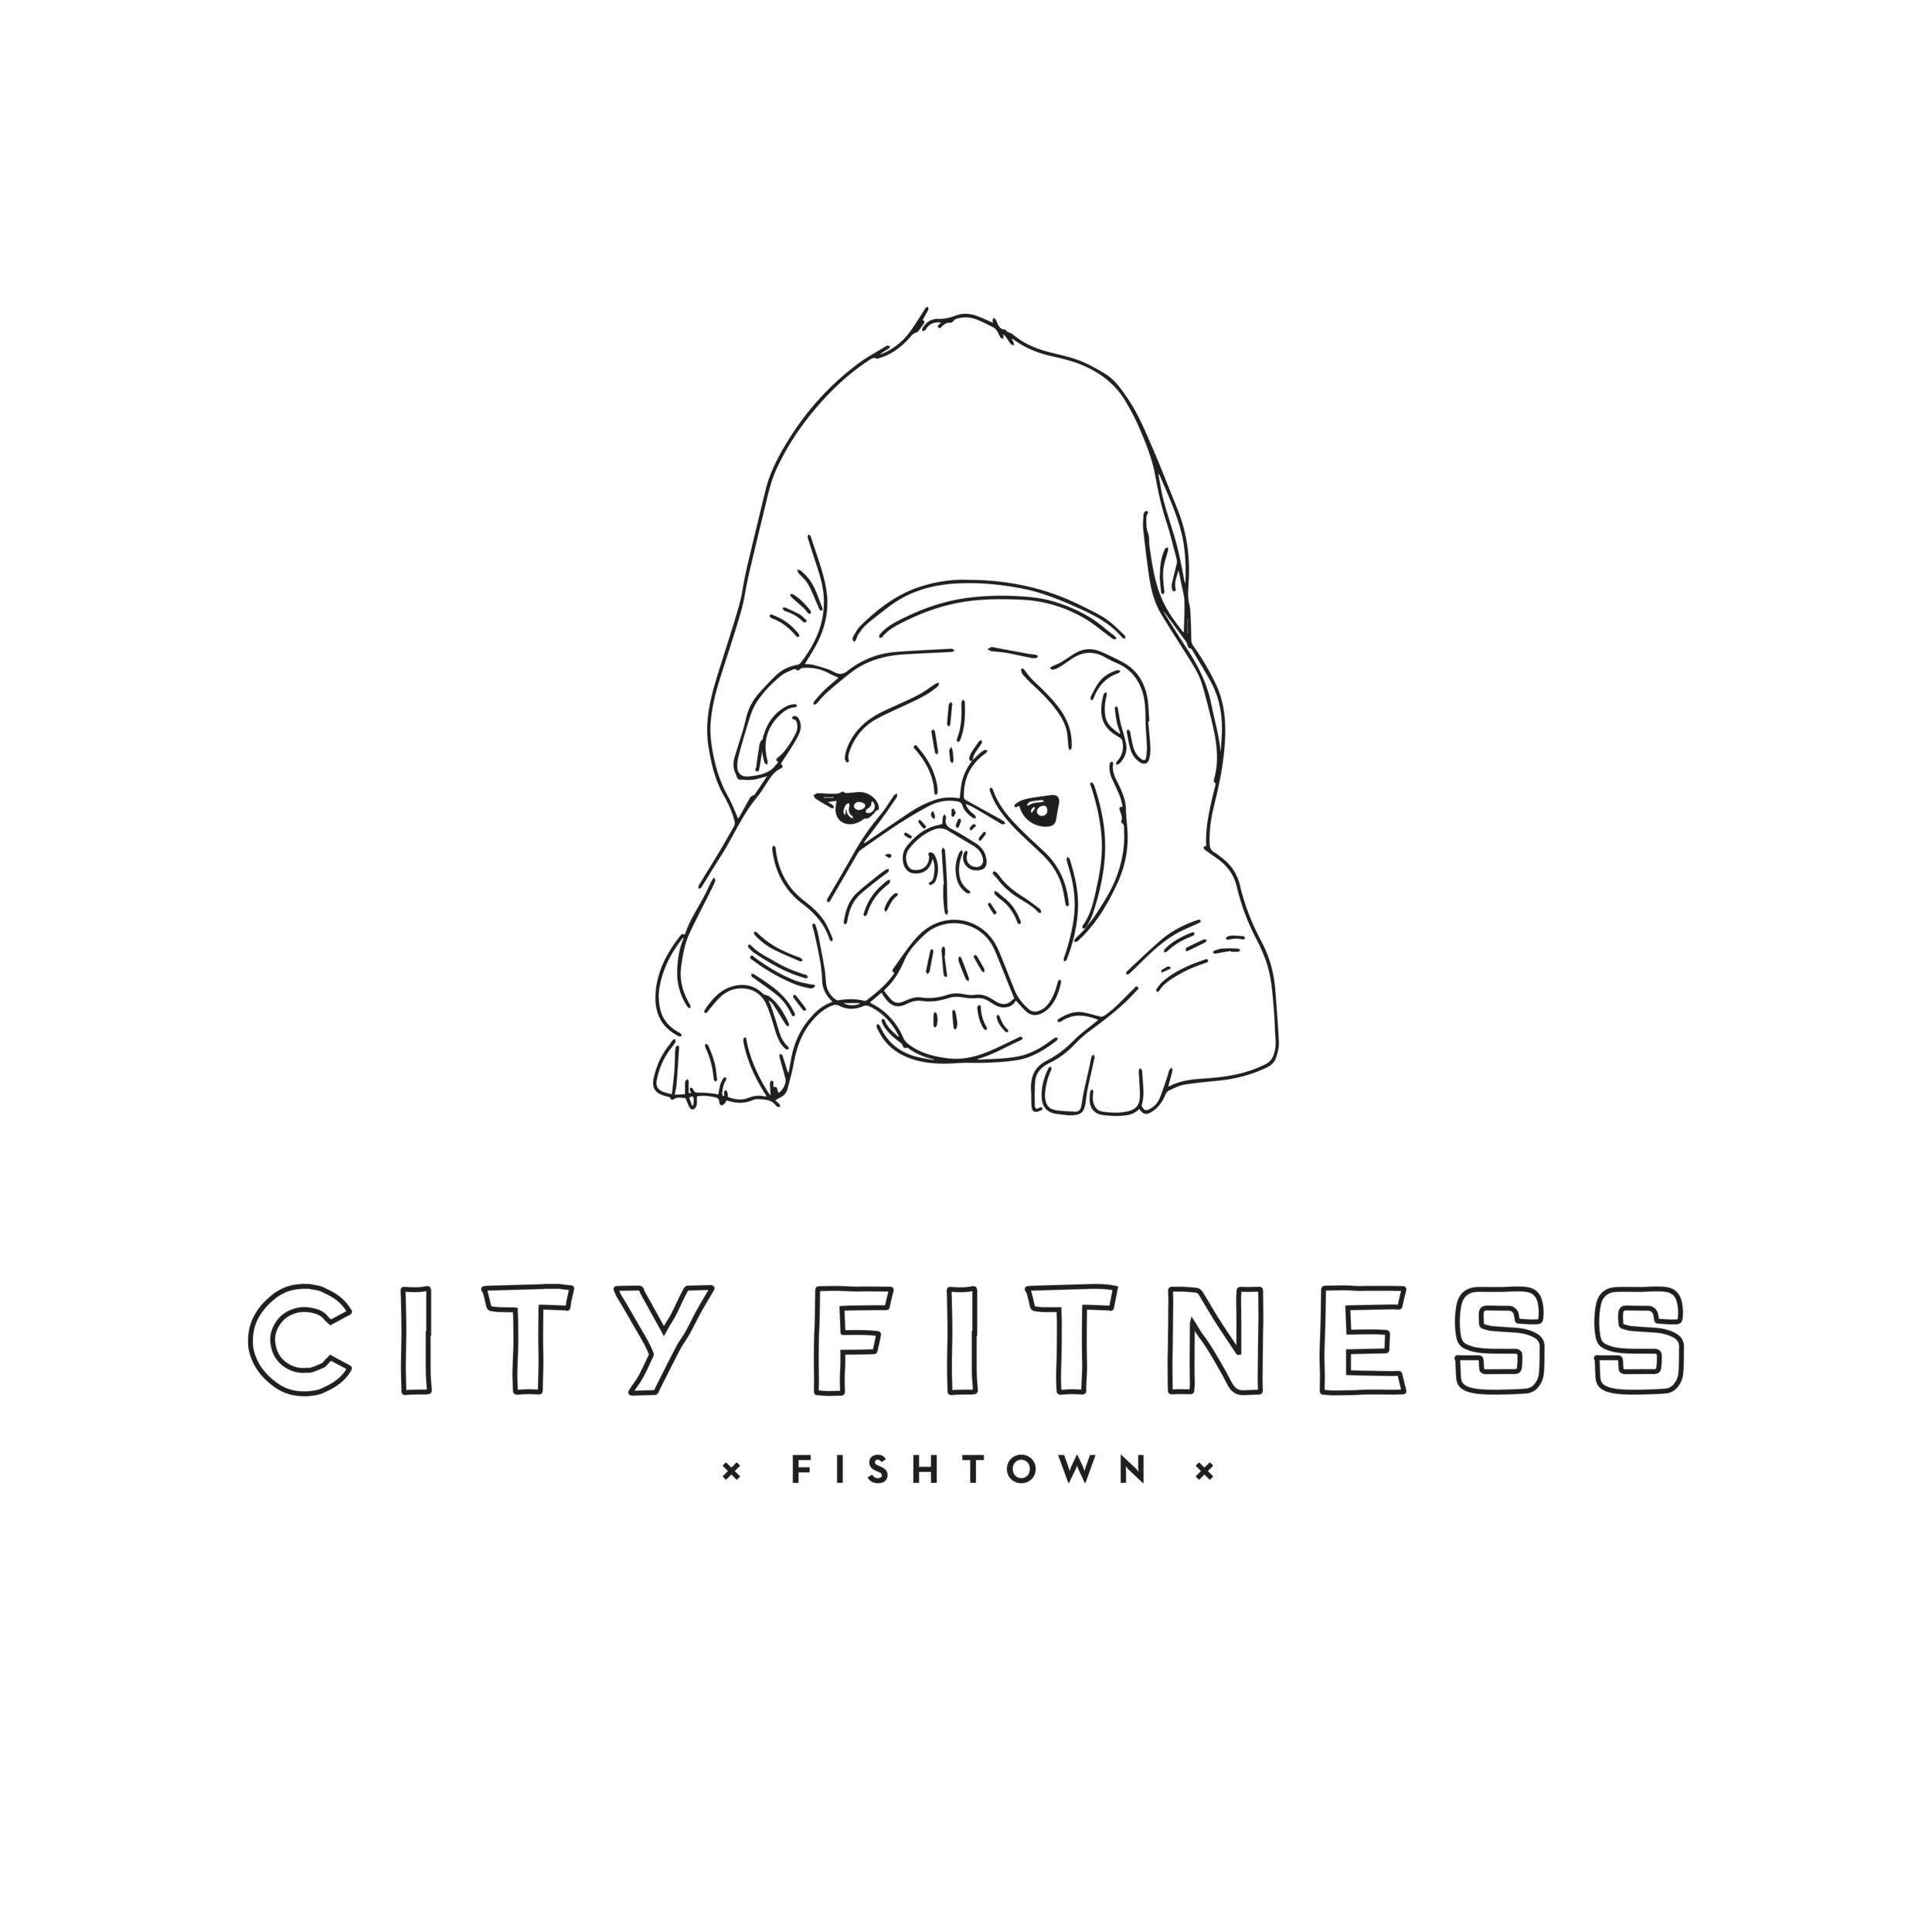 dogs-cityfitness_final_fishtown.png